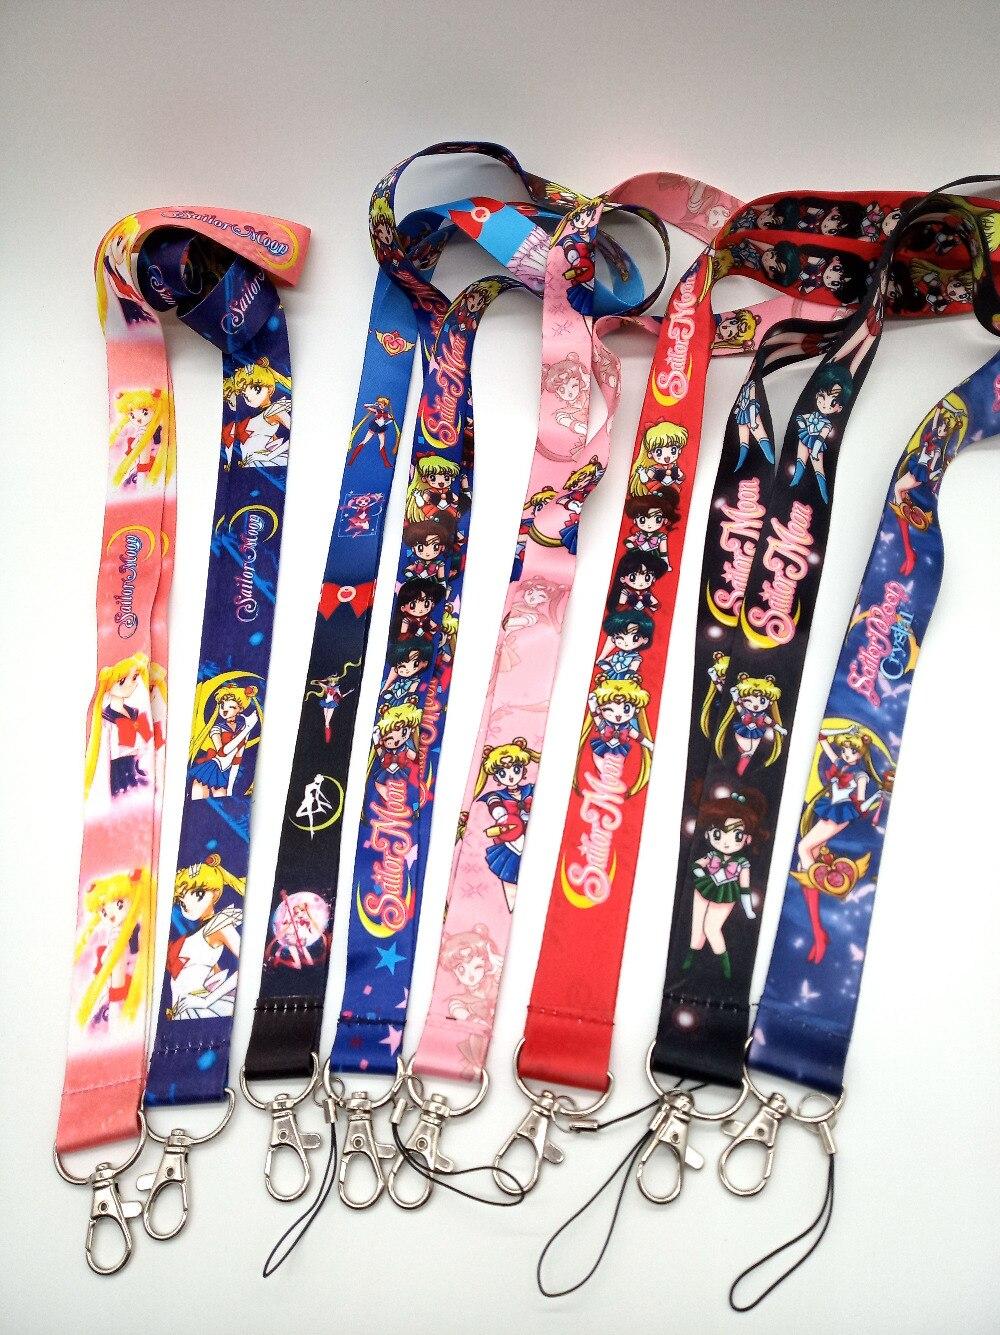 Hot Sale 50 pcs Popular Sailor Moon Japanese anime Lanyard Key Chains Neck lanyard Gifts Party